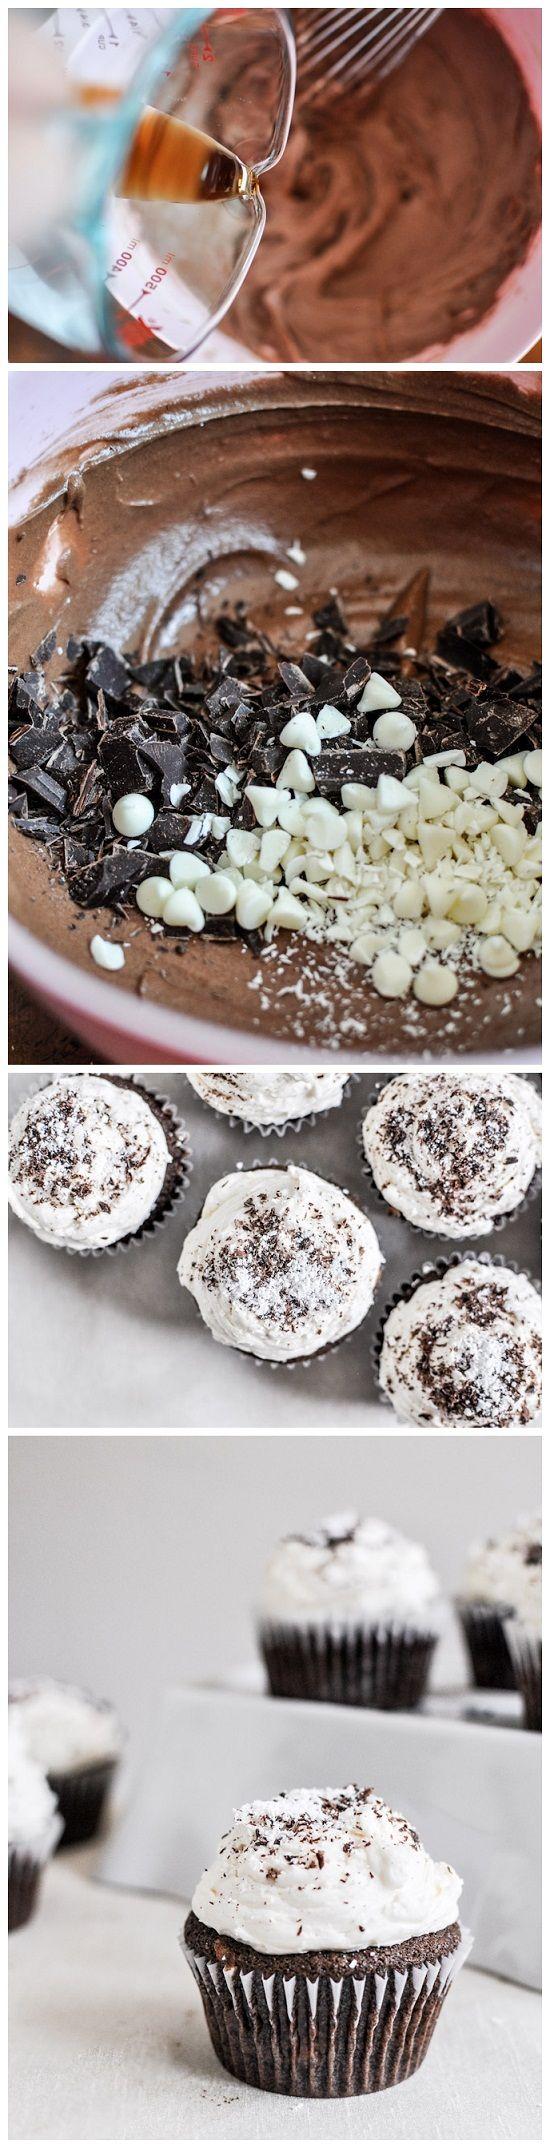 joysama images: Kahlua and Cream Double Chocolate Chunk Cupcakes